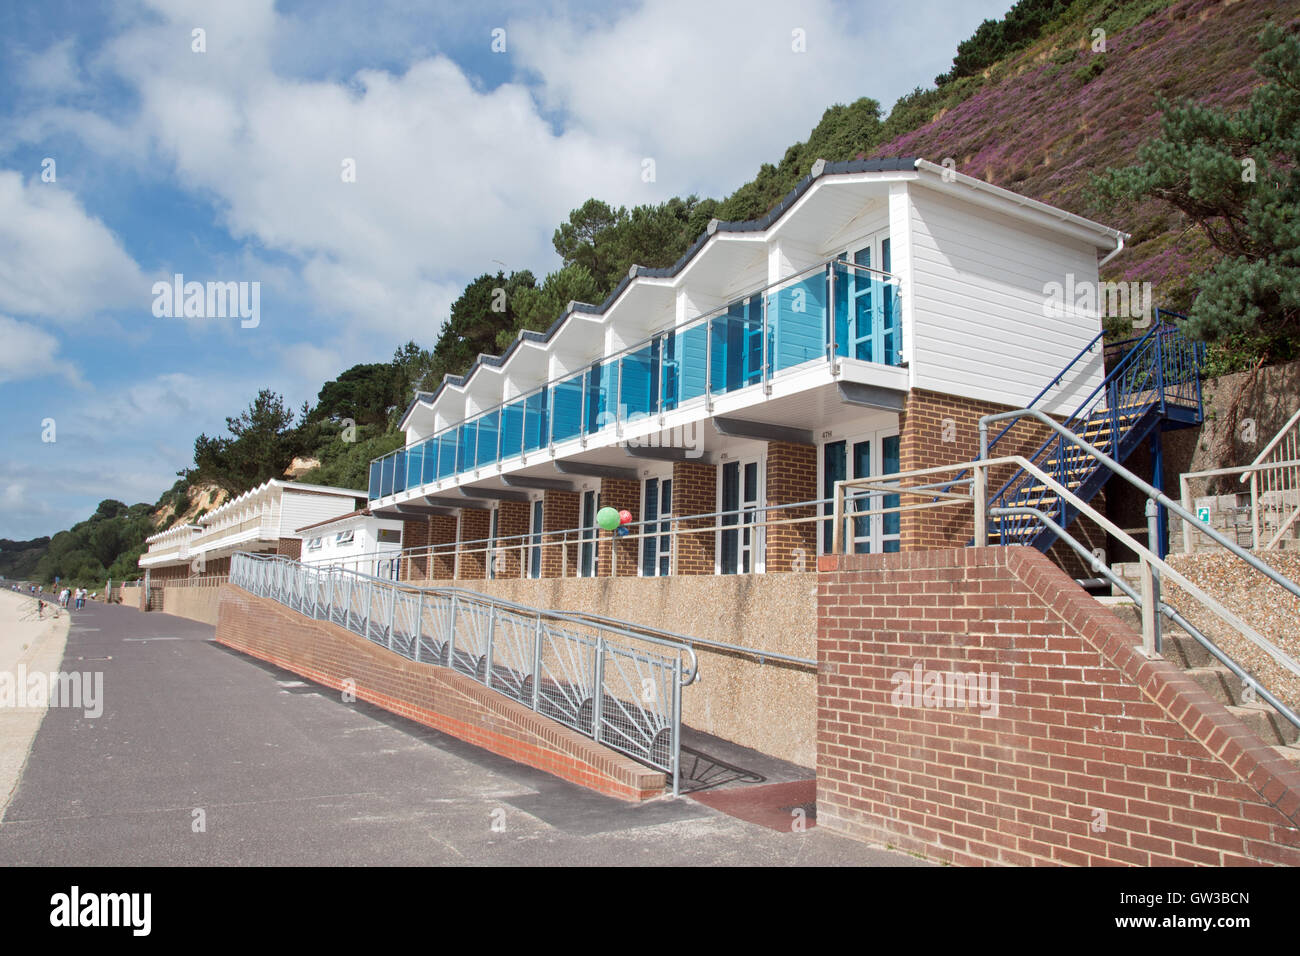 Quality beach huts at Branksome Beach, Poole, Dorset Stock Photo